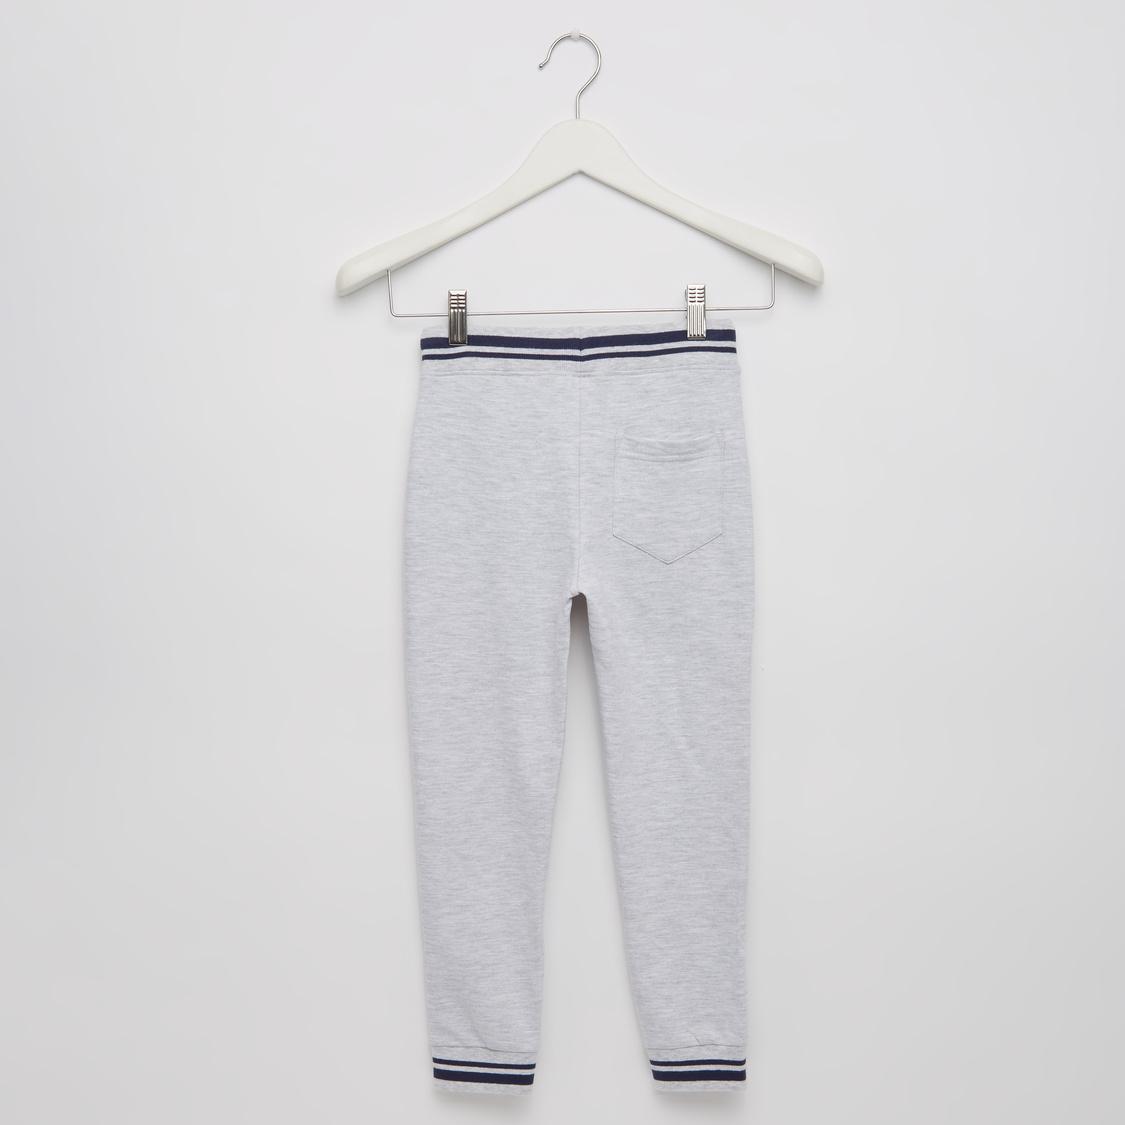 Typographic Print Hooded T-shirt and Jog Pants Set